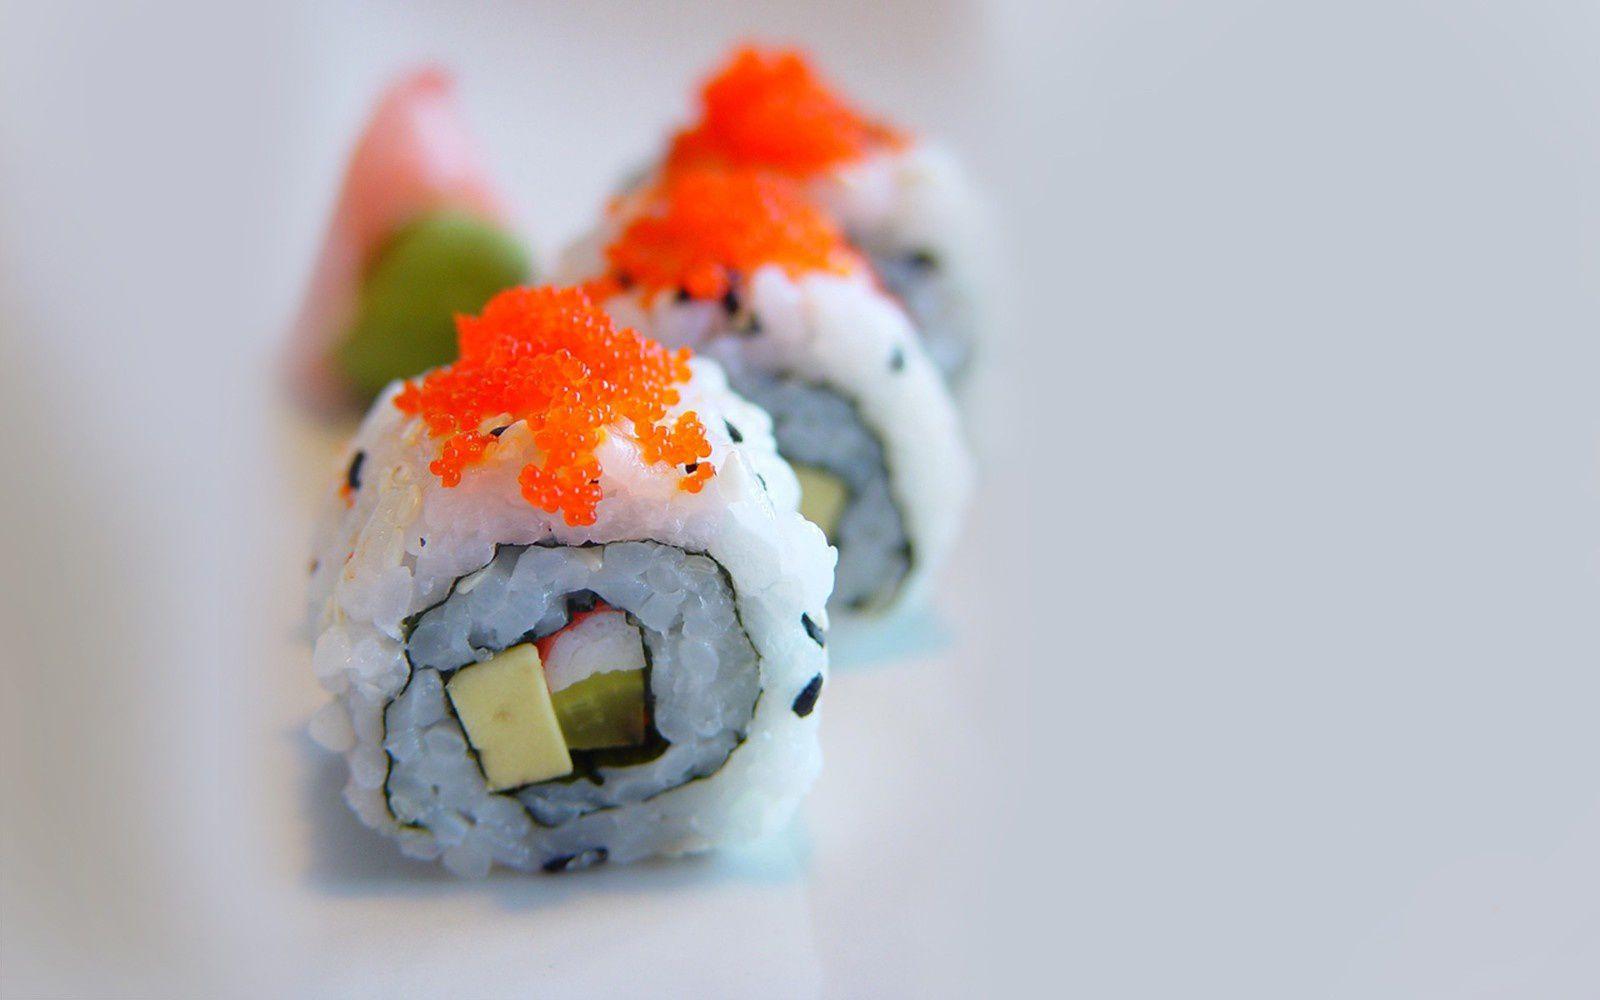 Bon appétit - Sushis - Nourriture - Wallpaper - Free